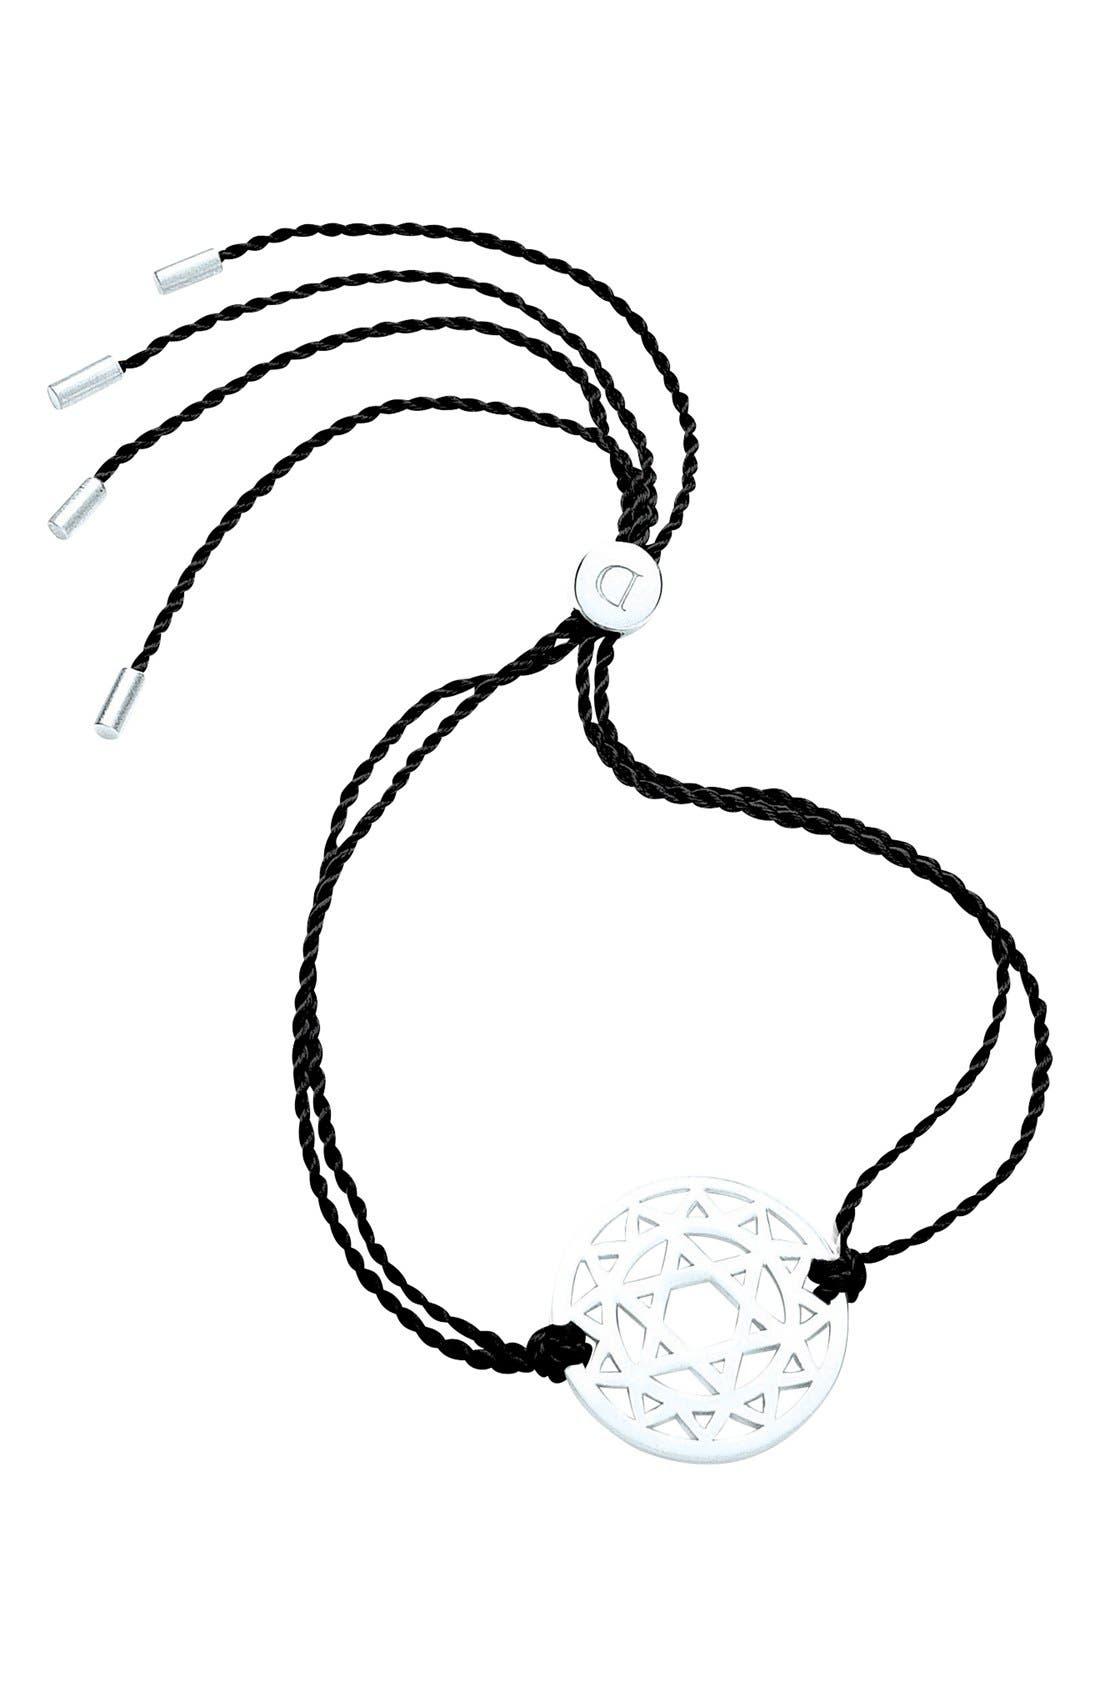 Alternate Image 1 Selected - Daisy London 'Heart Chakra' Cord Bracelet